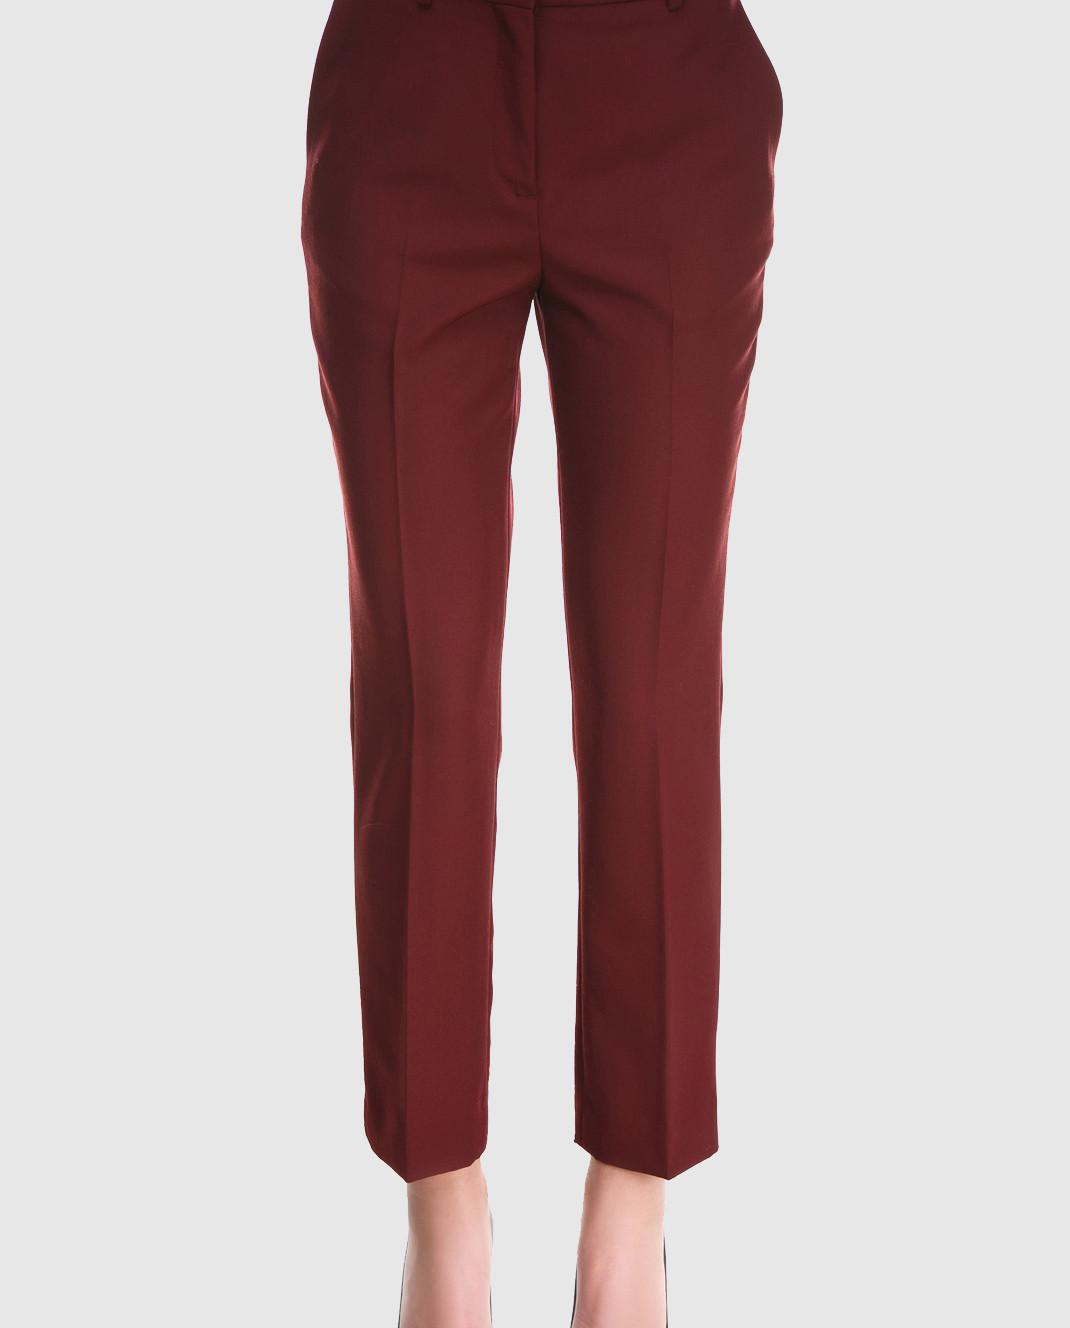 Victoria by Victoria Beckham Бордовые брюки из шерсти TRVV085B изображение 4